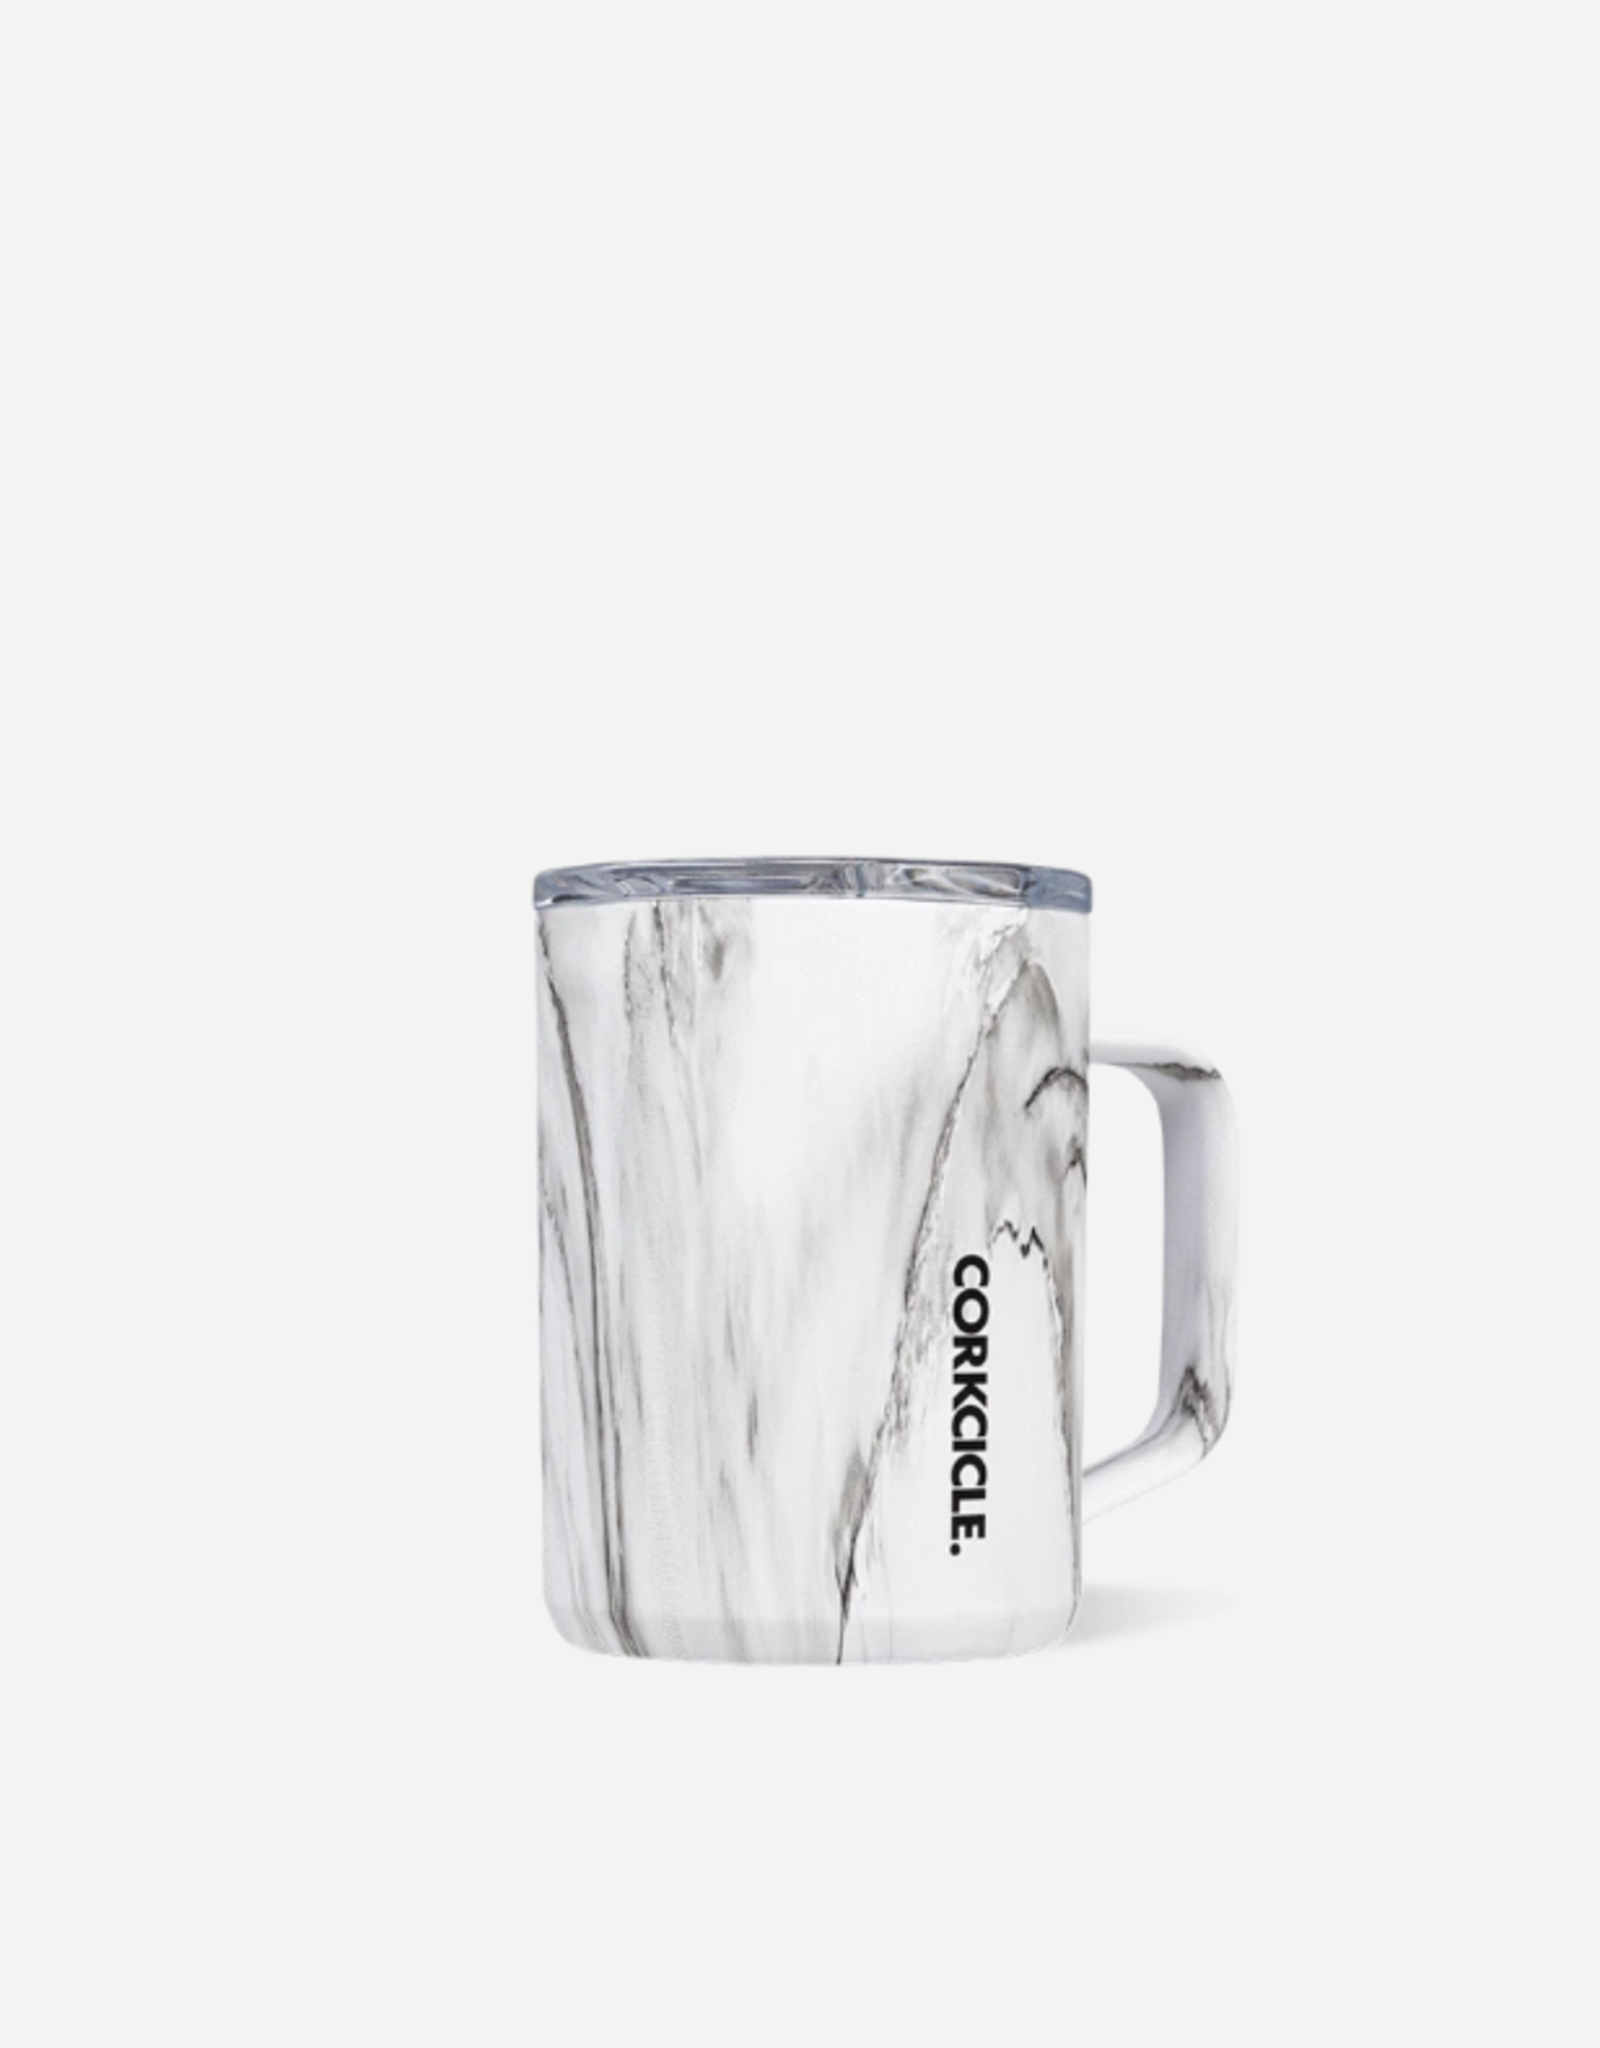 Corkcicle Corkcicle Mug 16oz, Snowdrift